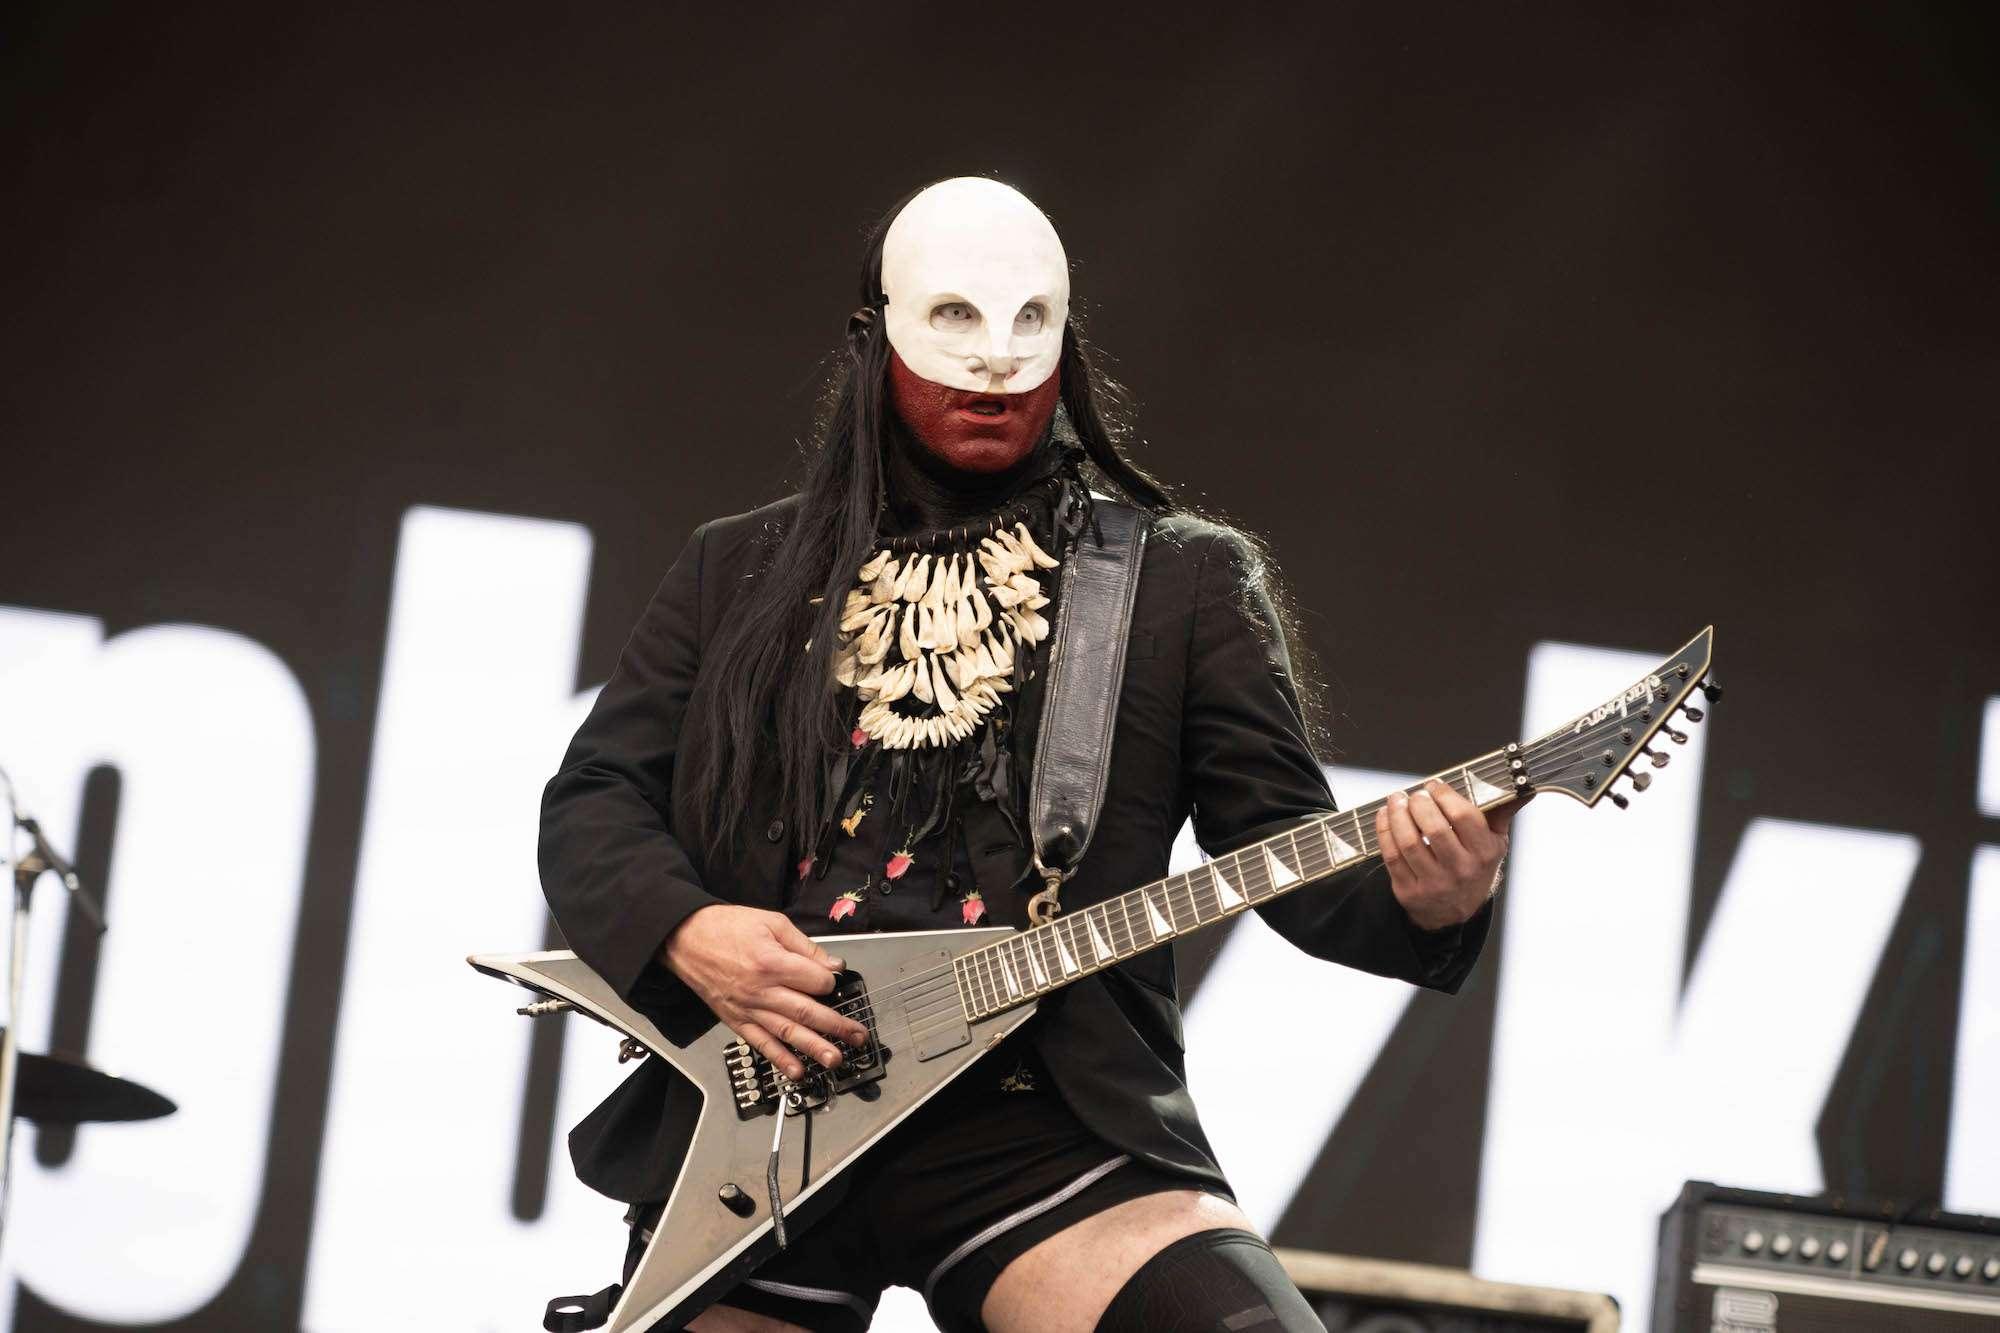 Limp Bizkit Live at Lollapalooza [GALLERY] 33